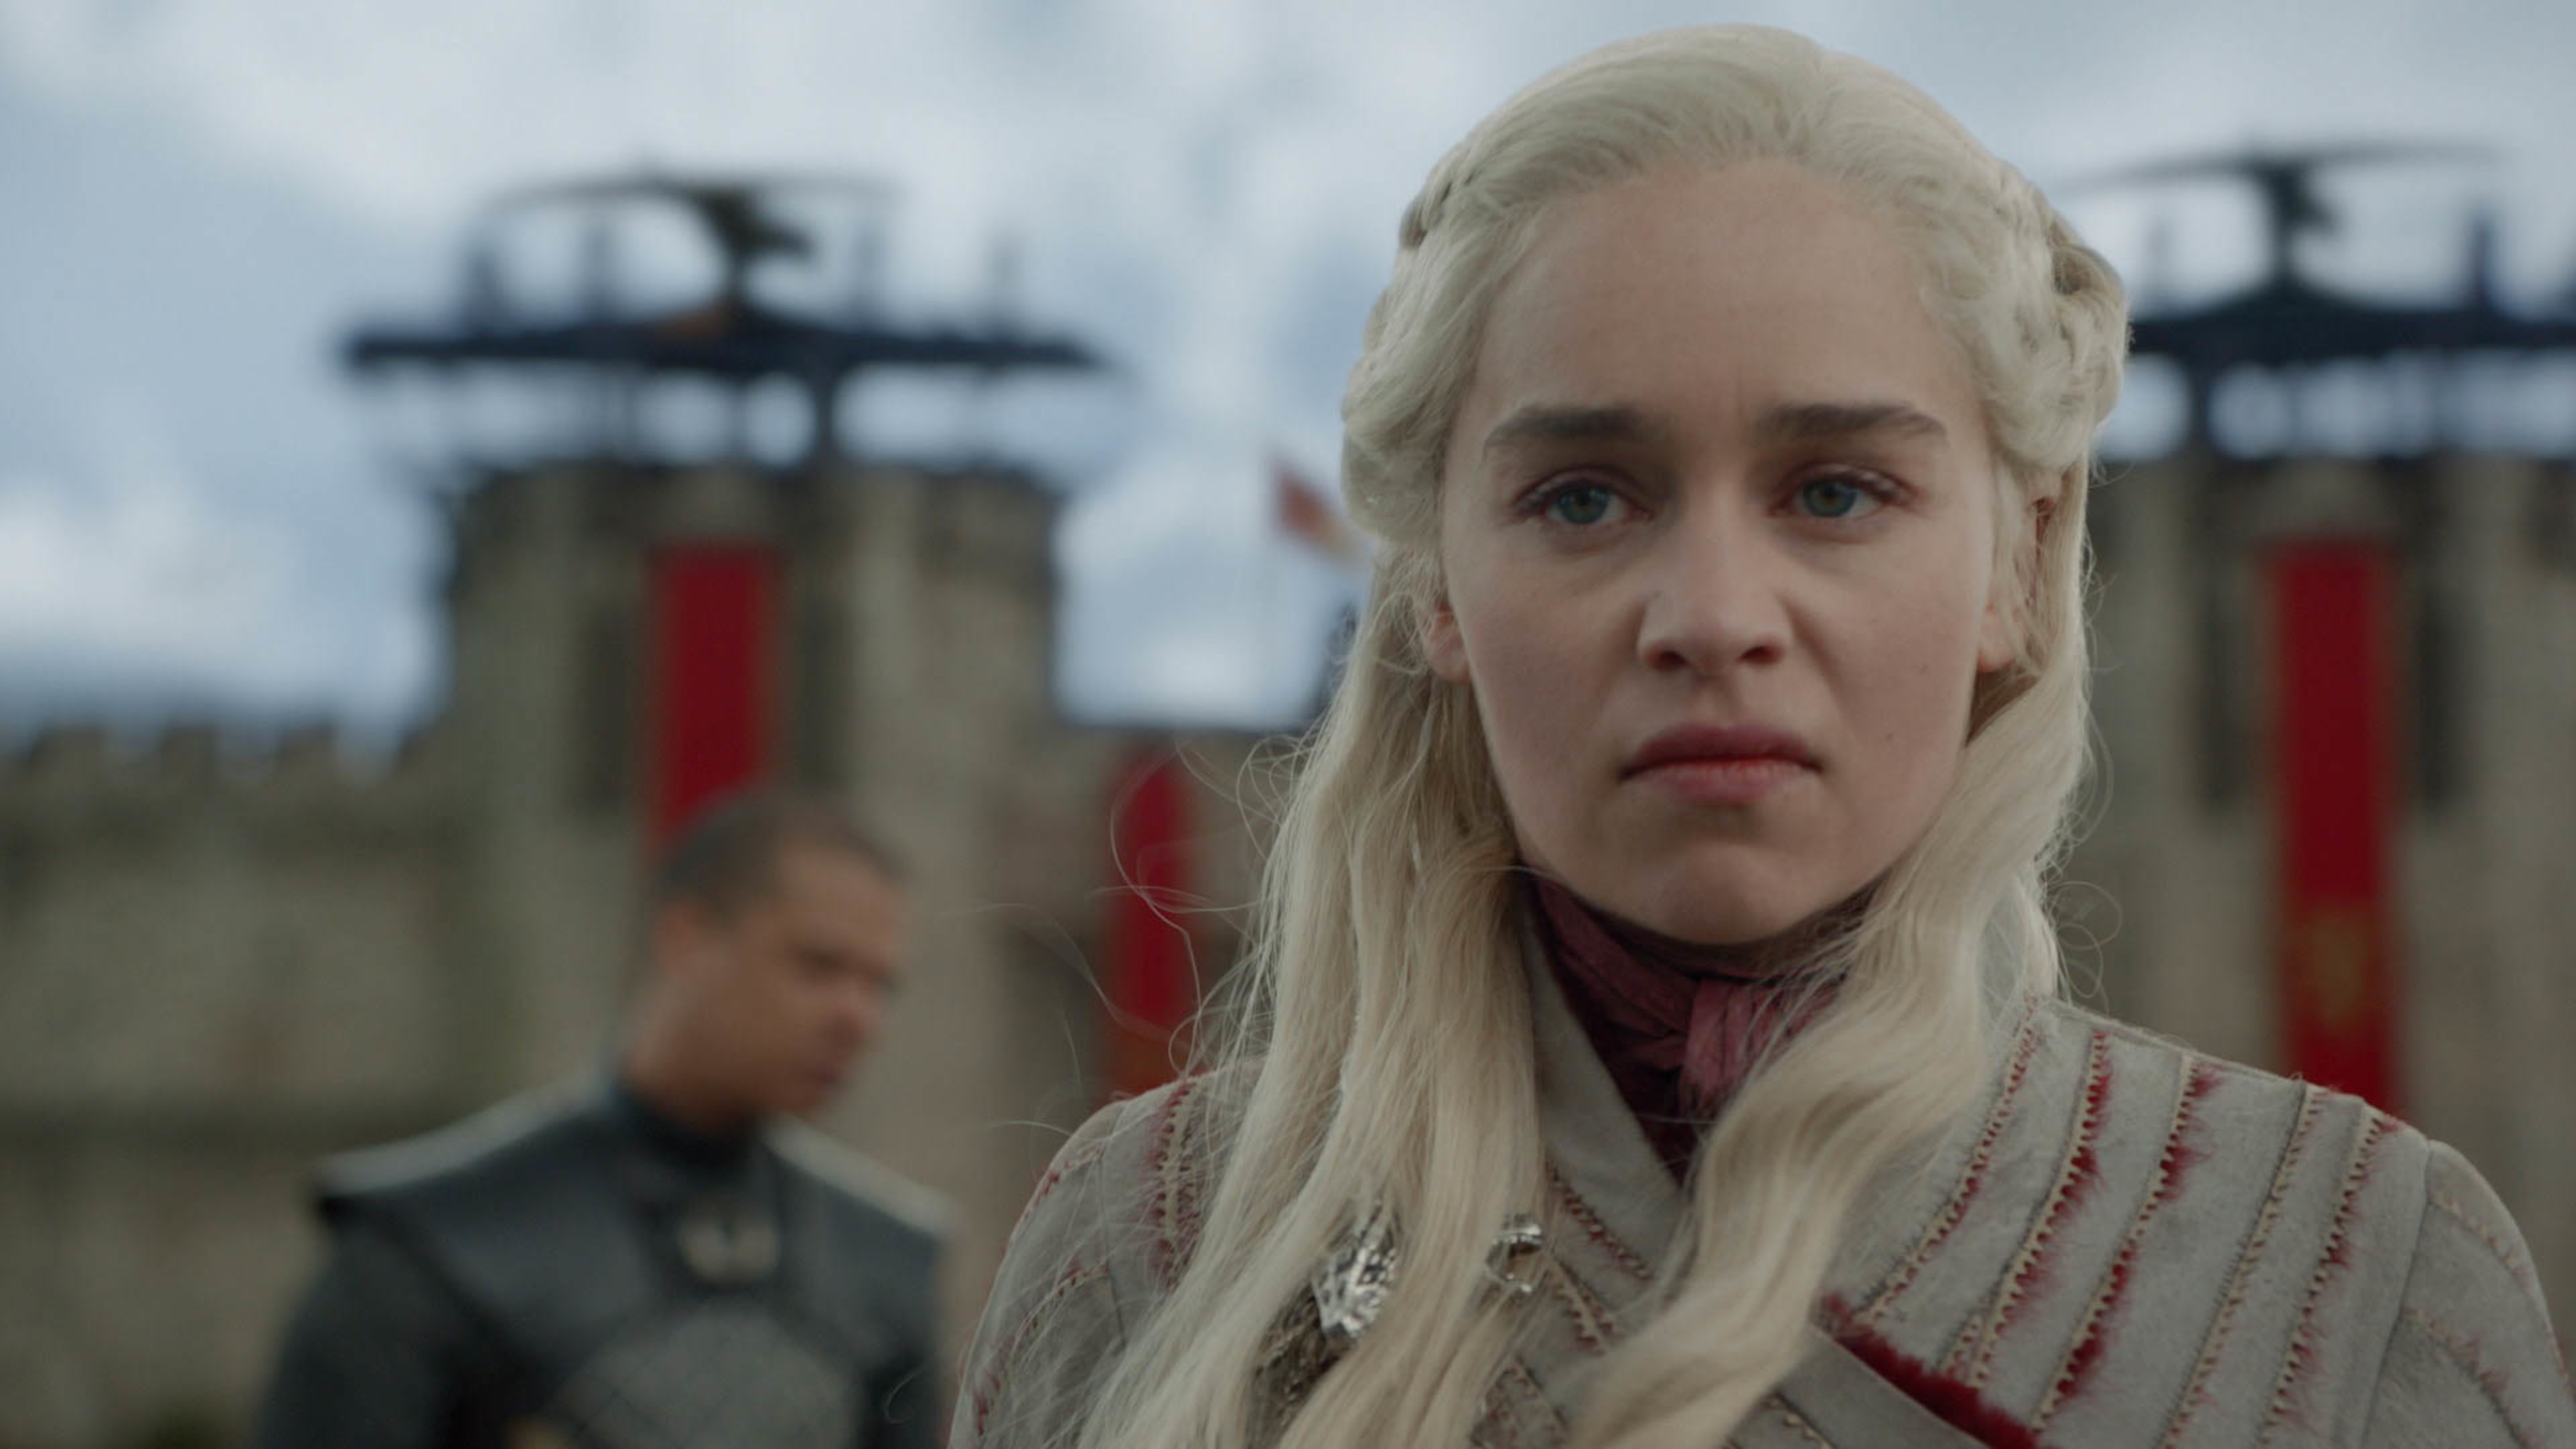 daenerys 150x150 - Emilia Clarke hates the new Daenerys Targaryen too